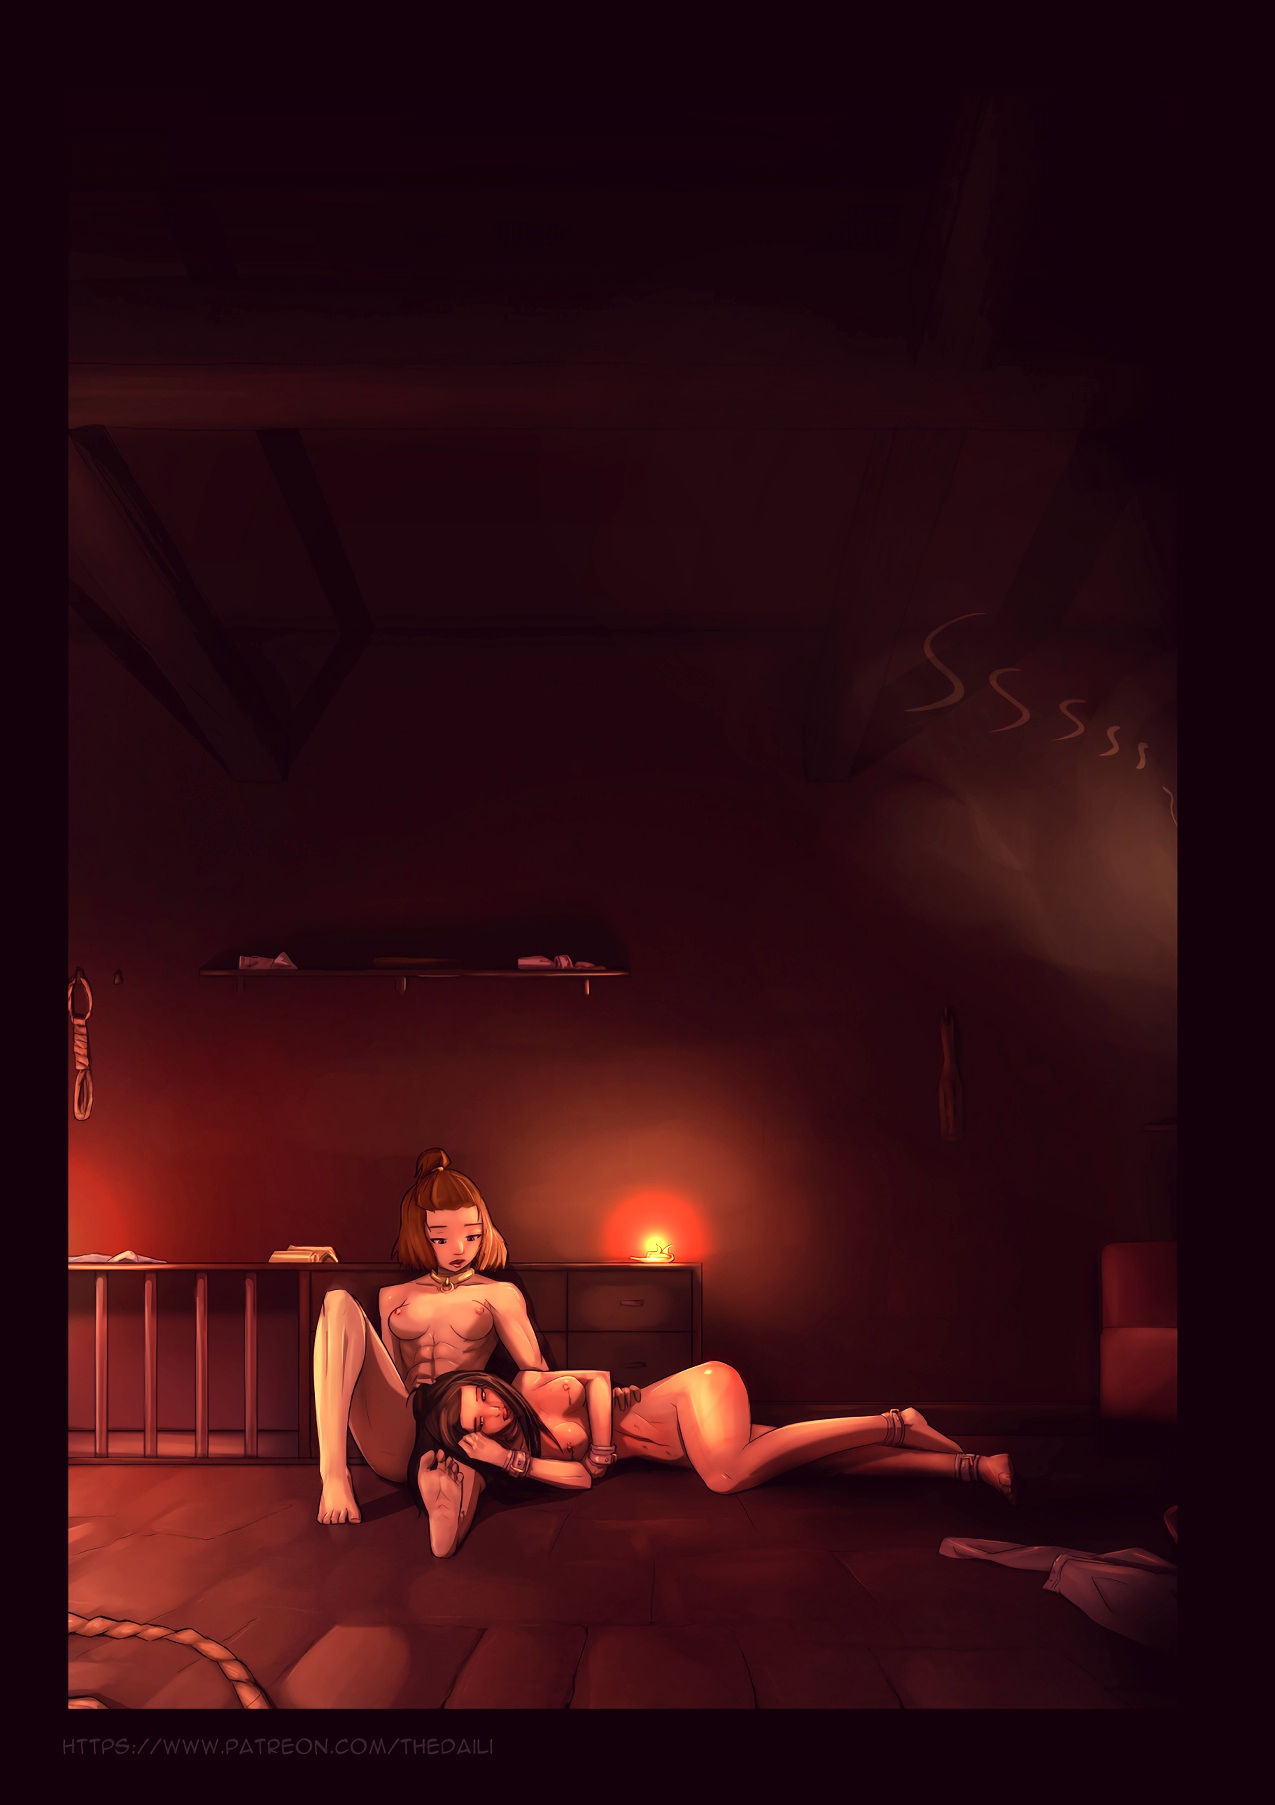 Volition porn comic picture 39